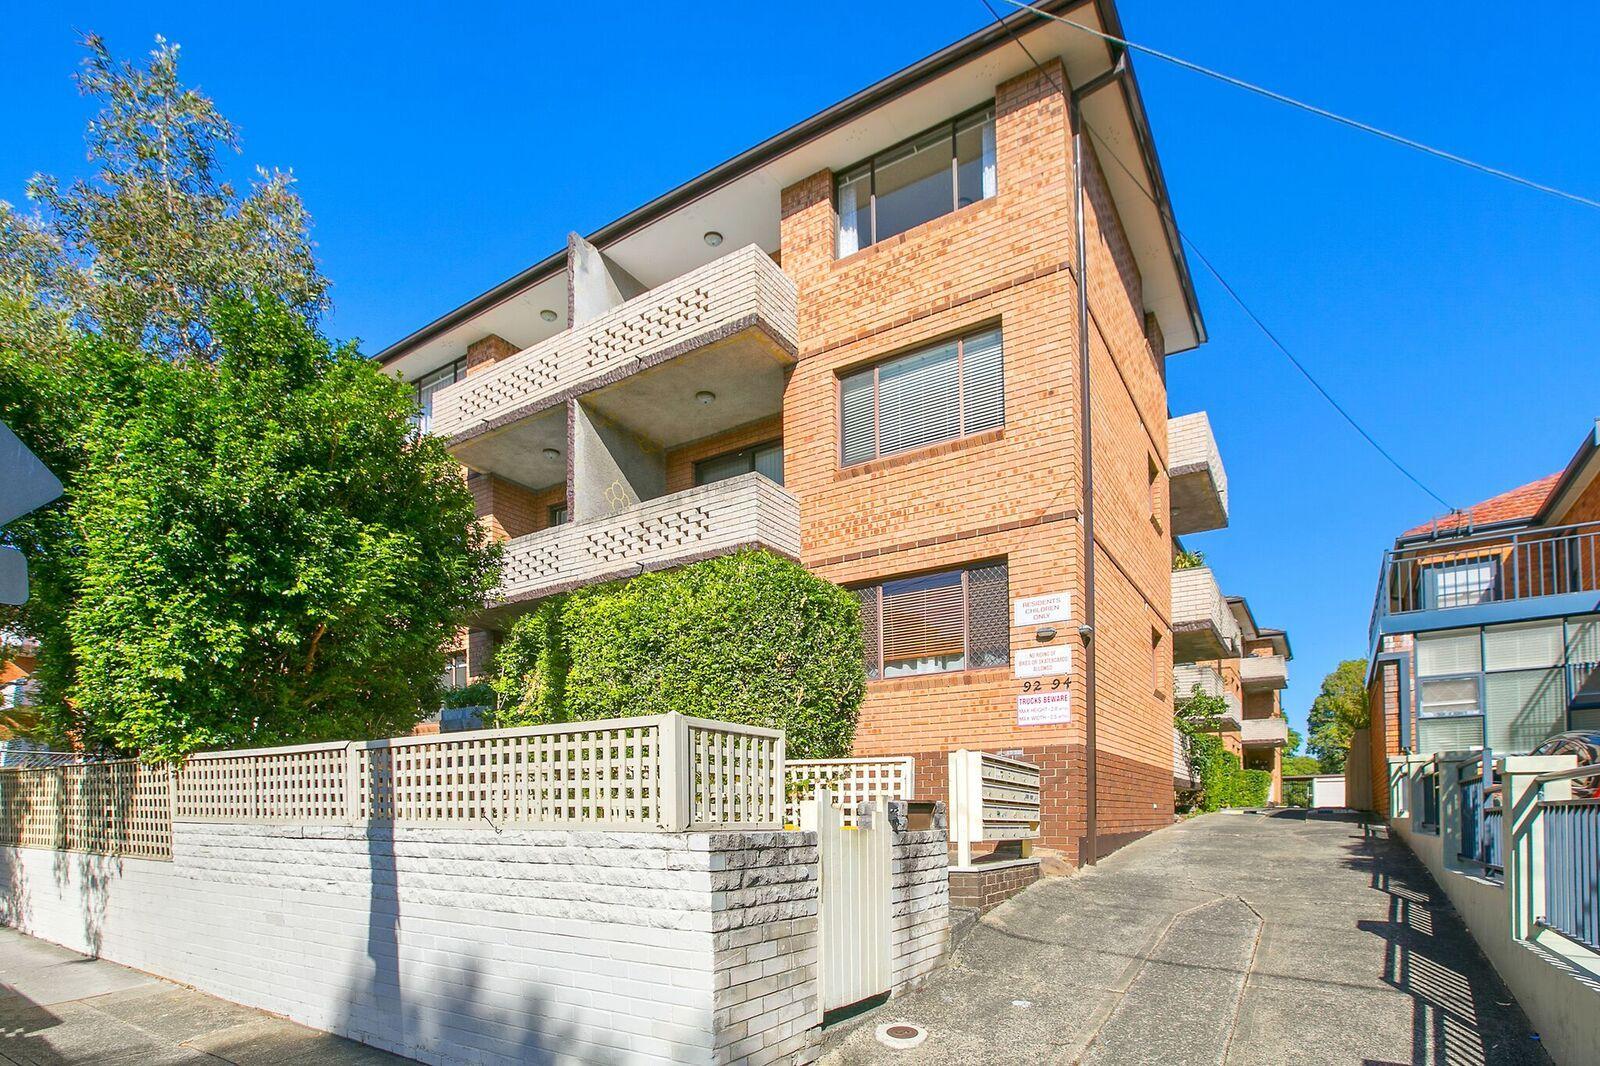 14/92-94 Cambridge Street, Stanmore NSW 2048, Image 0